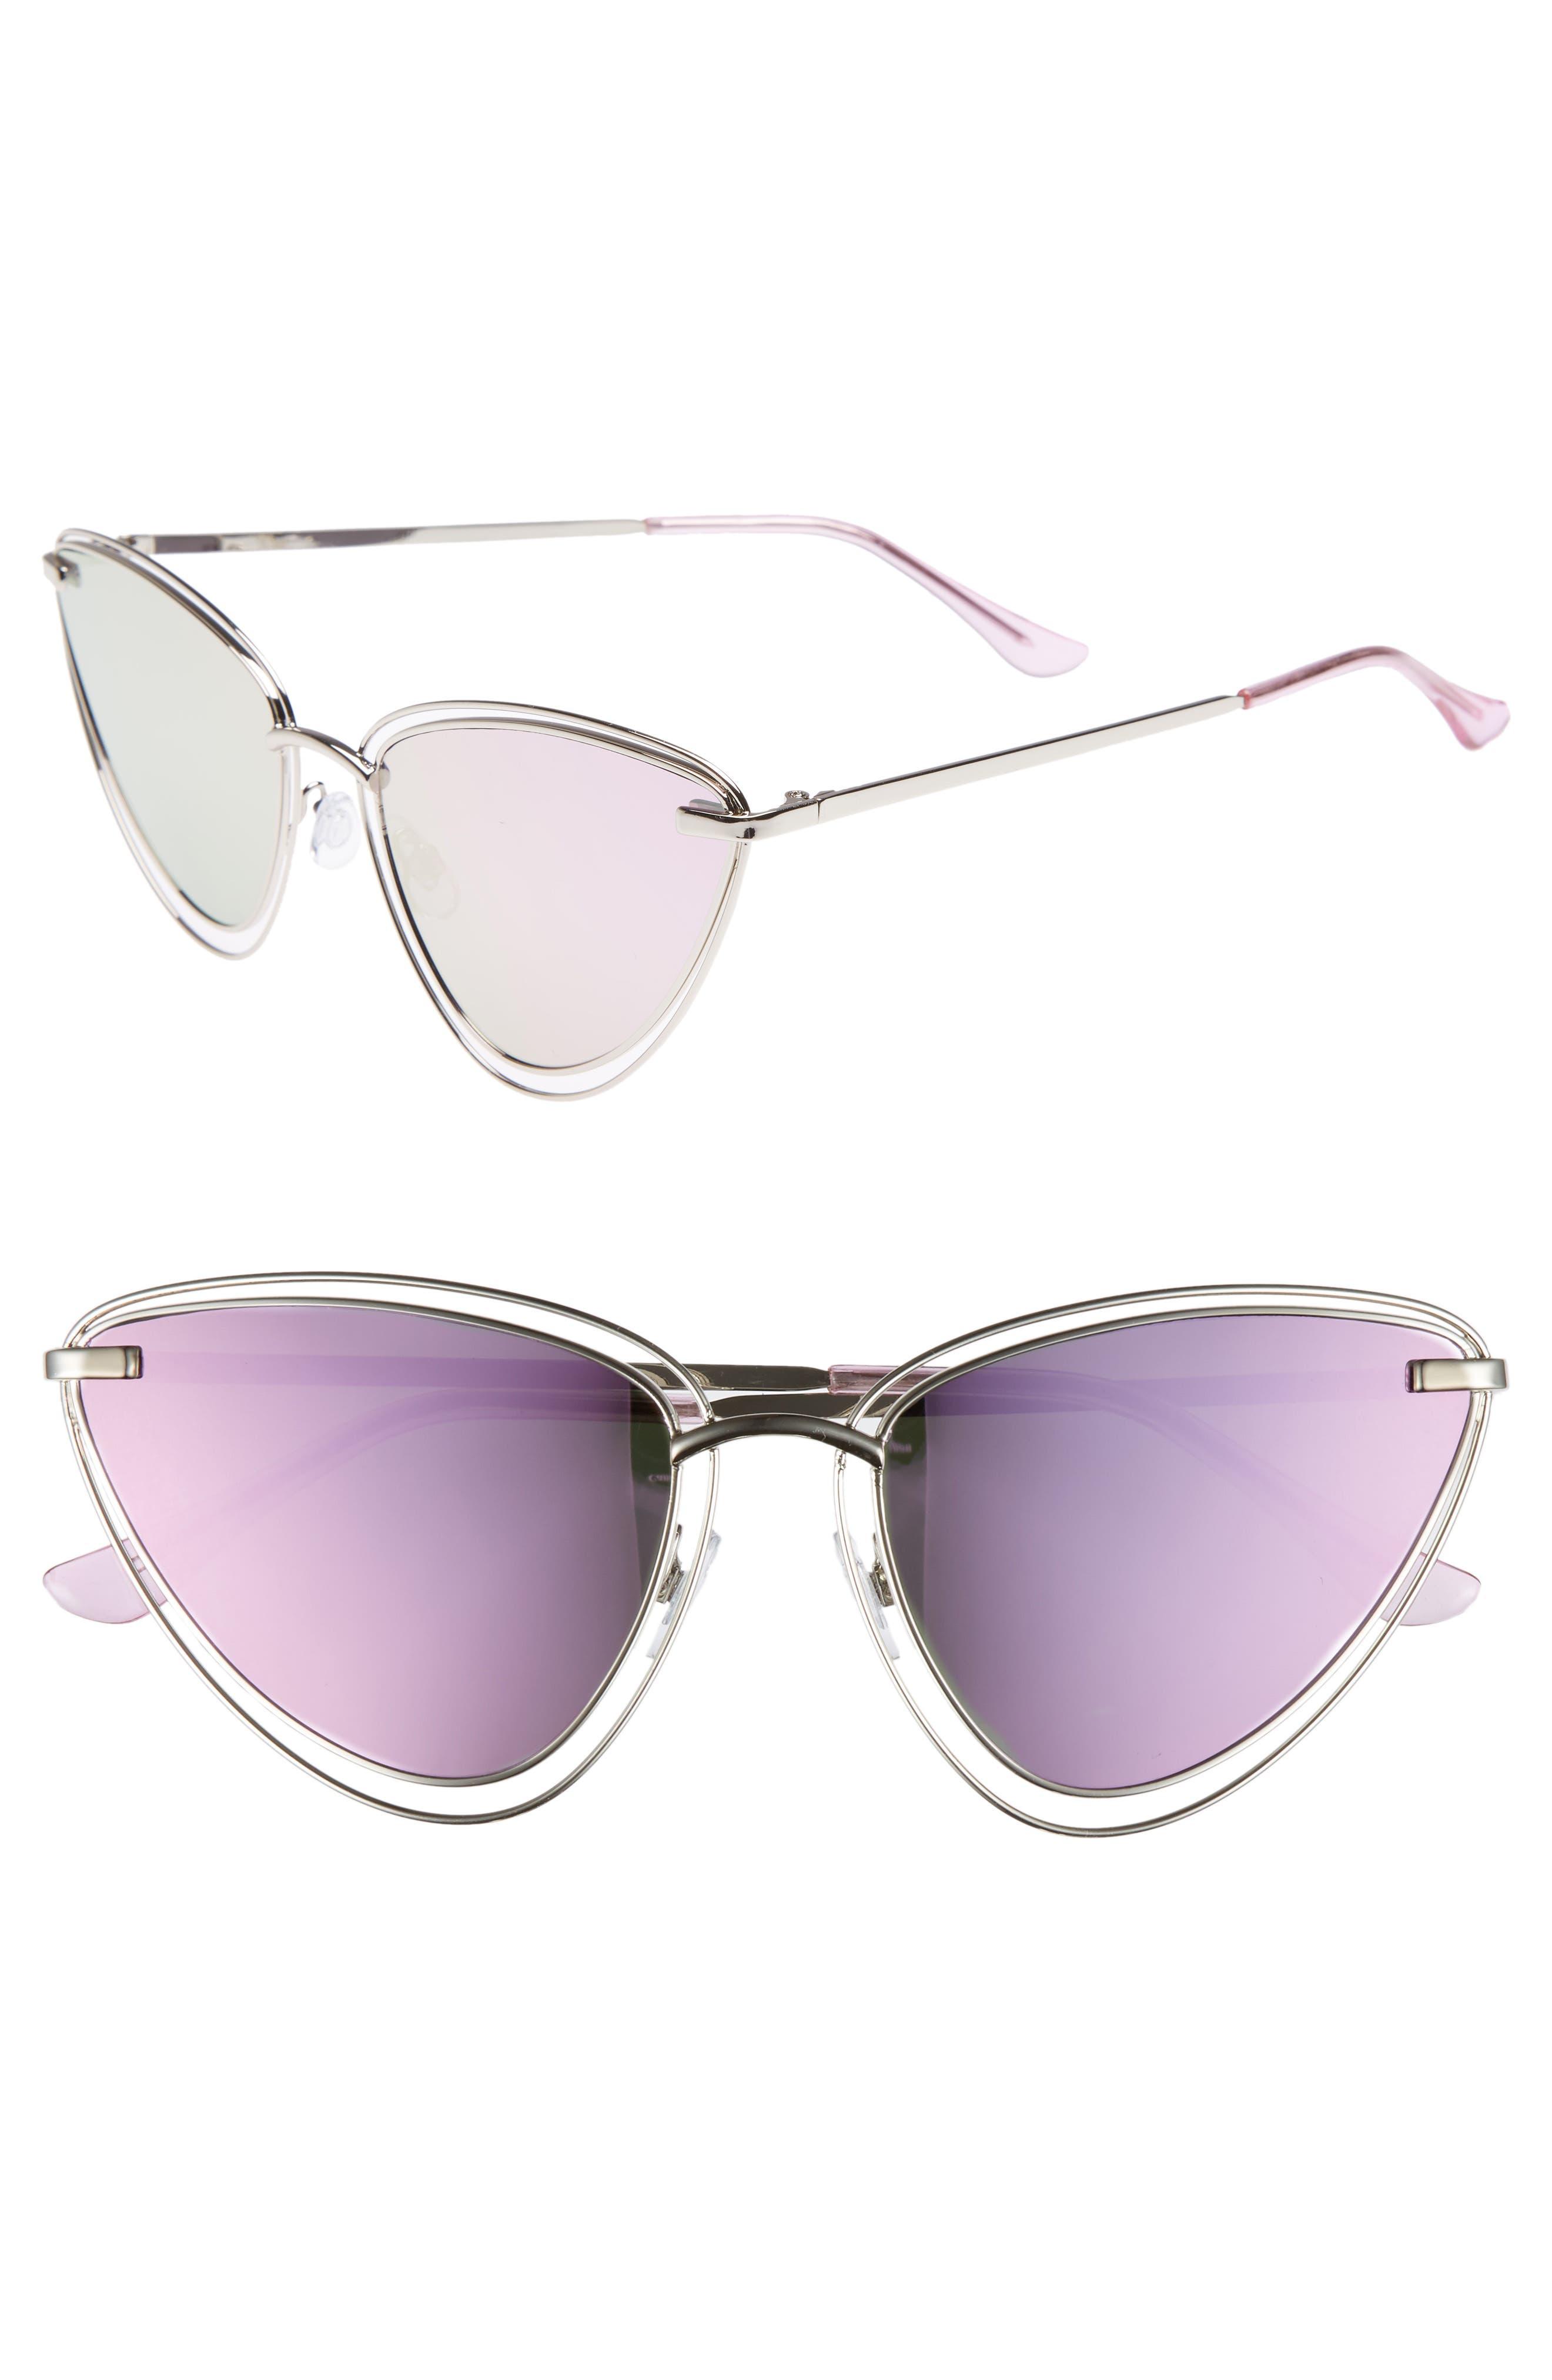 55mm Metal Cat Eye Sunglasses,                             Main thumbnail 1, color,                             040